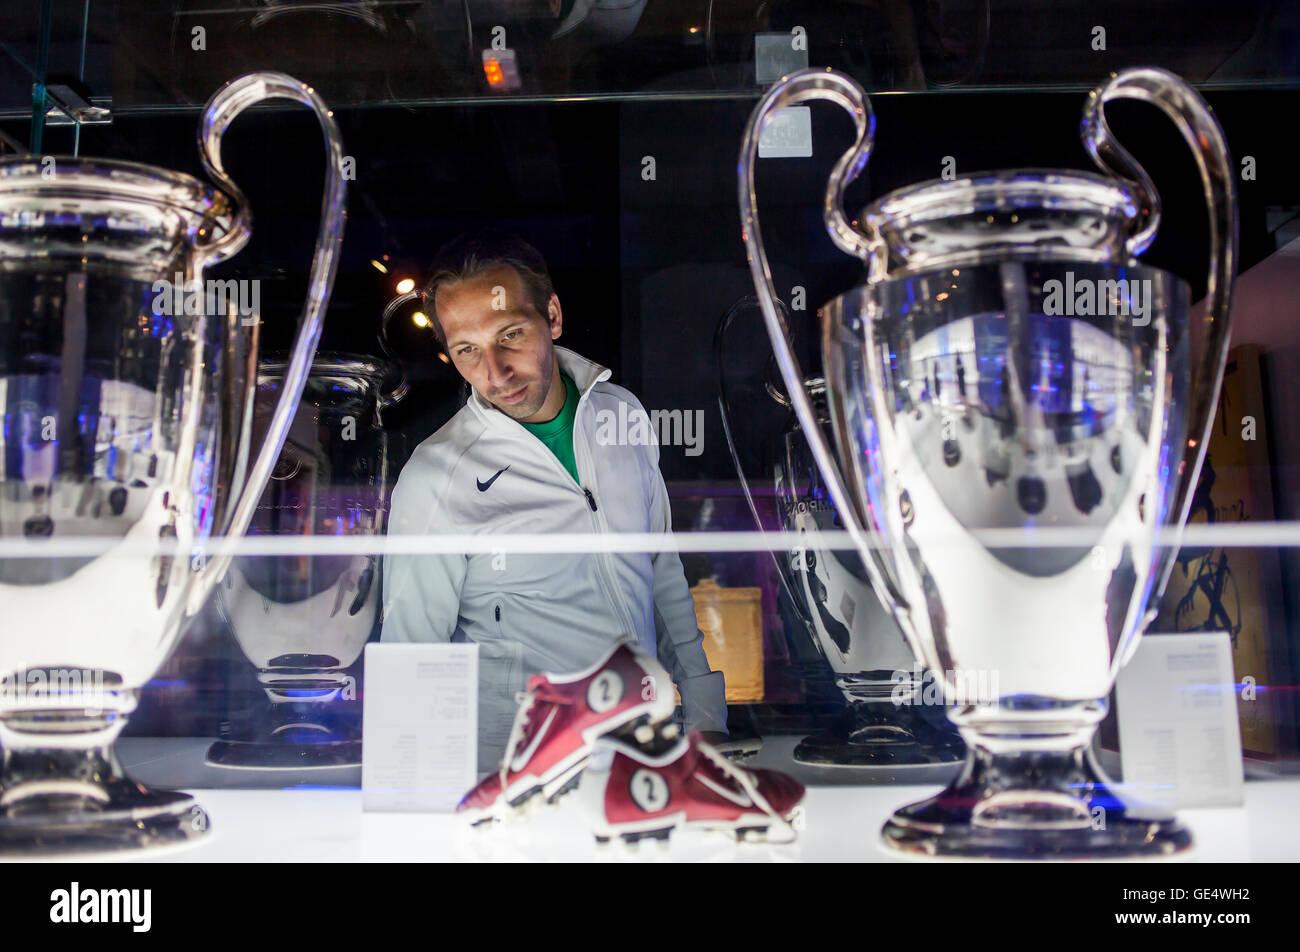 European Cups, Museu FC Barcelona, FC Barcelona Museum, Nou Camp, Barcelona, Catalonia, Spain. - Stock Image